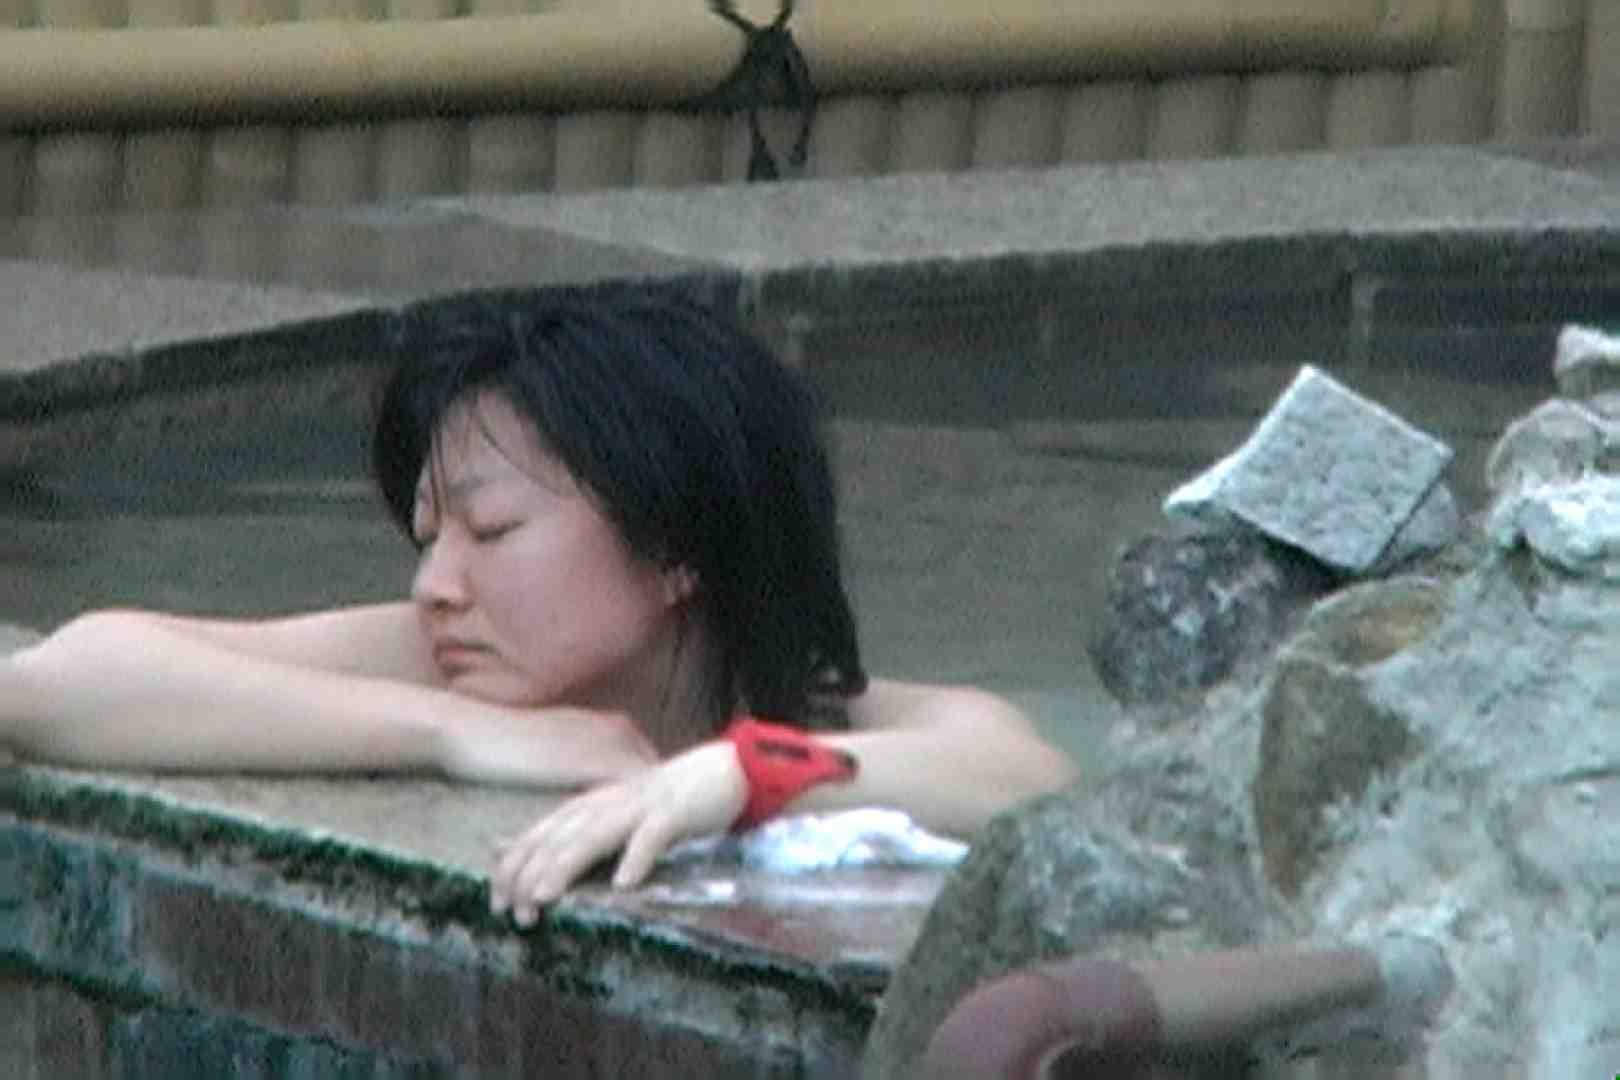 Aquaな露天風呂Vol.649 0 | 0  102連発 13